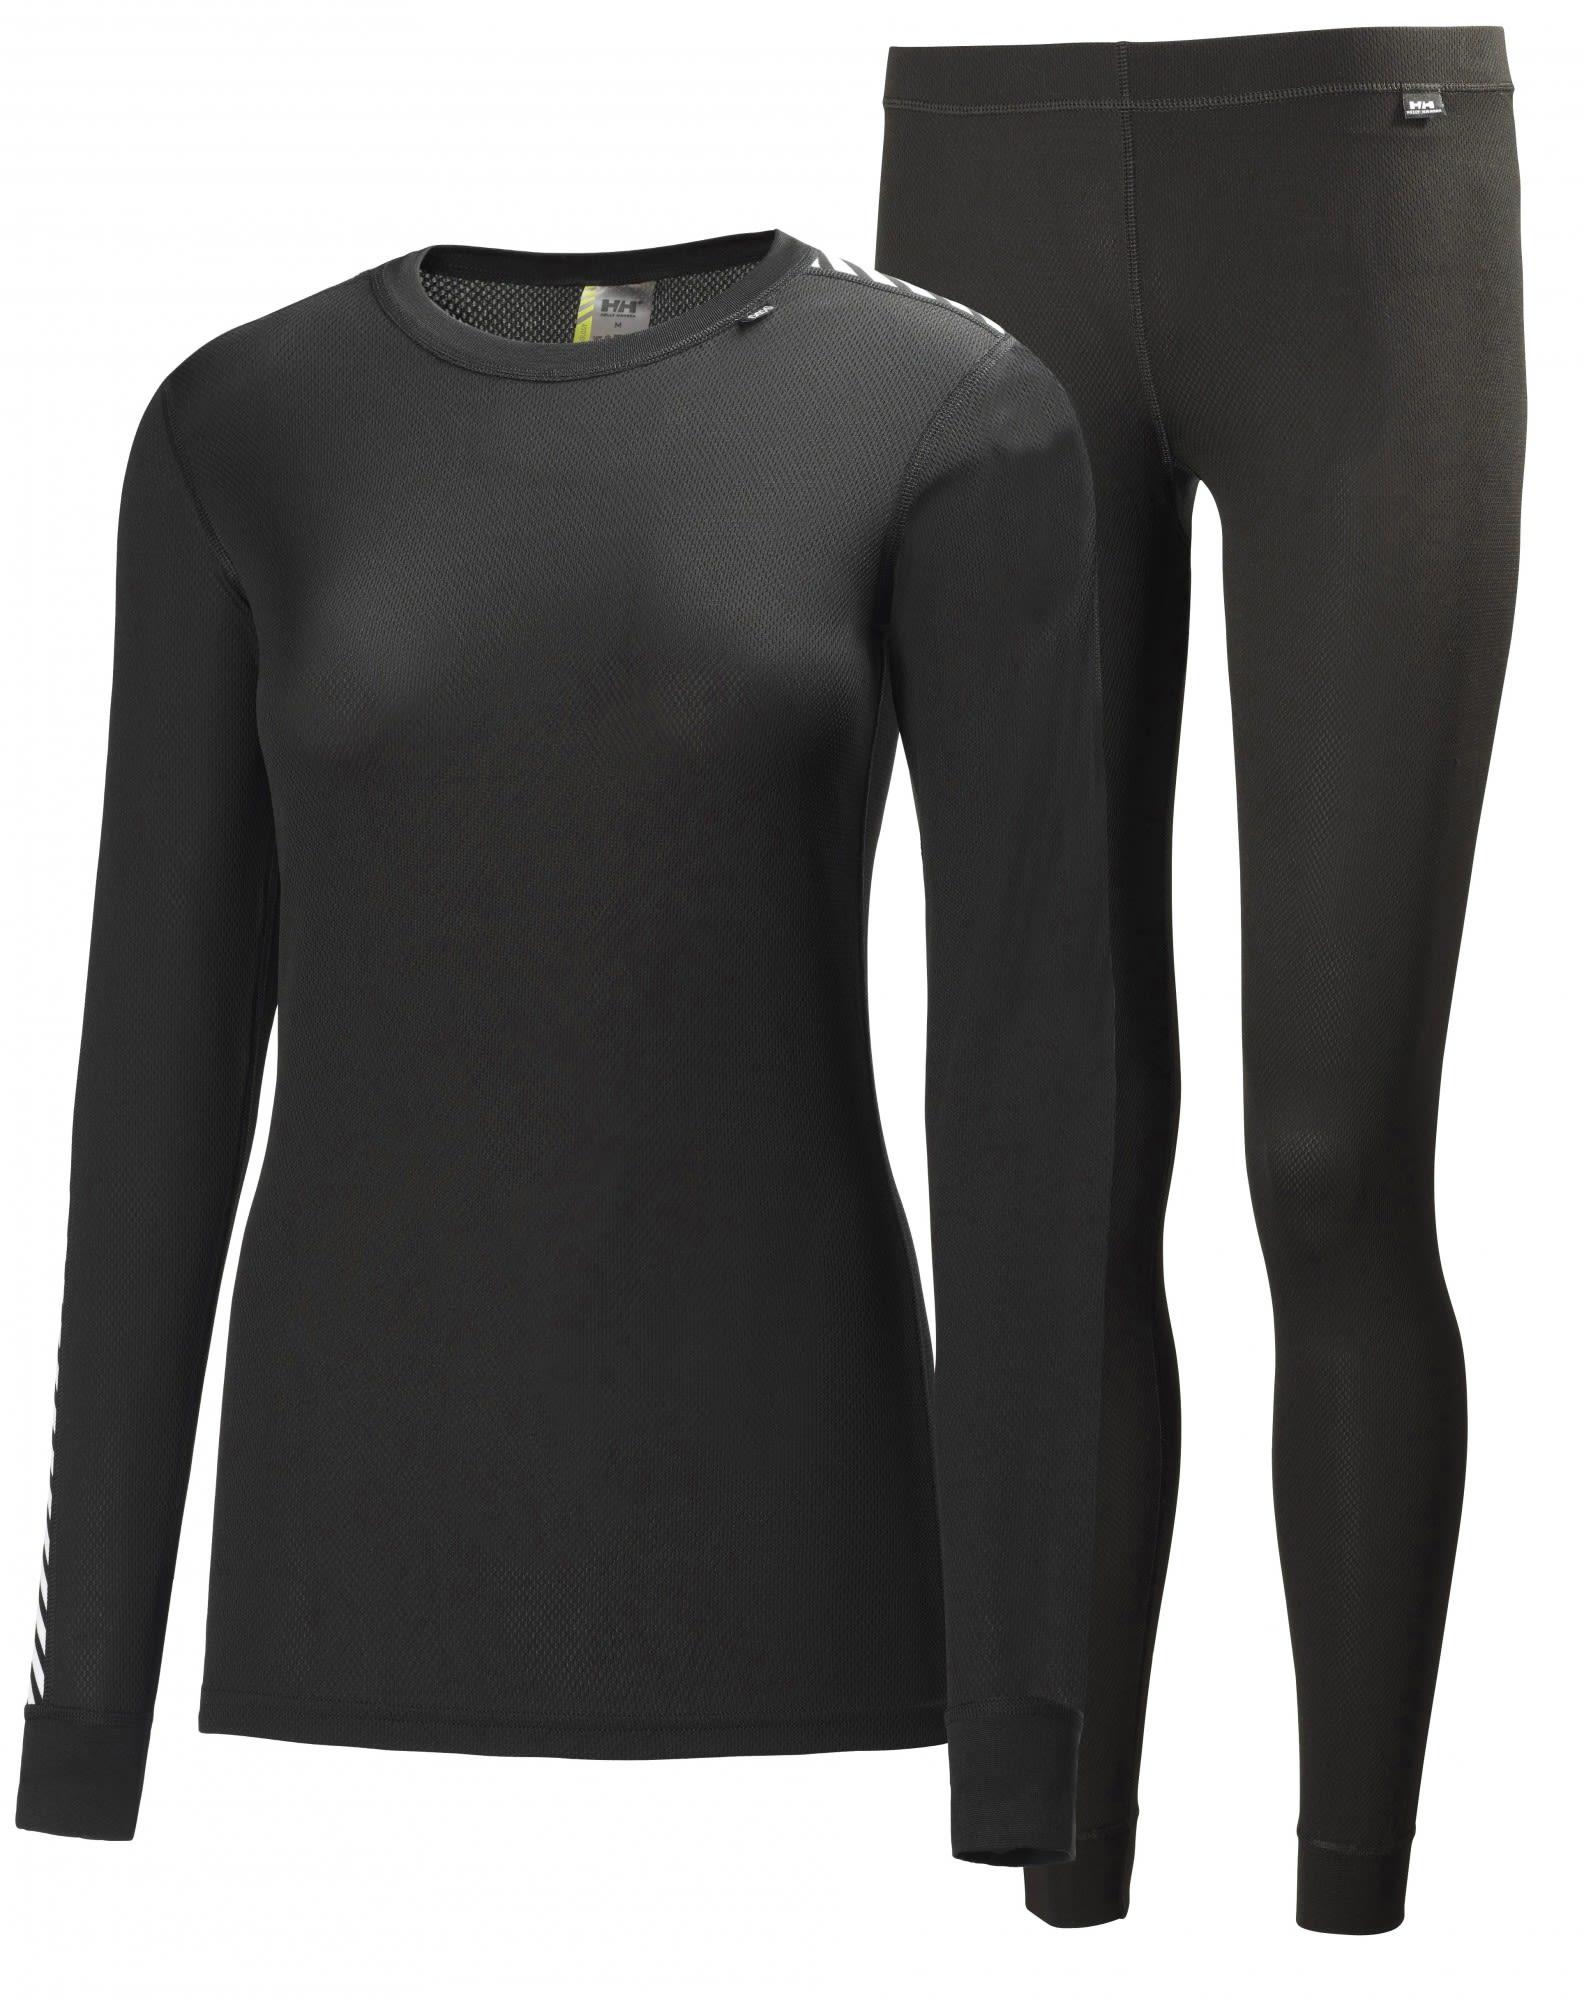 Helly Hansen HH Comfort Light Set Schwarz, Female Langarm-Shirt, S